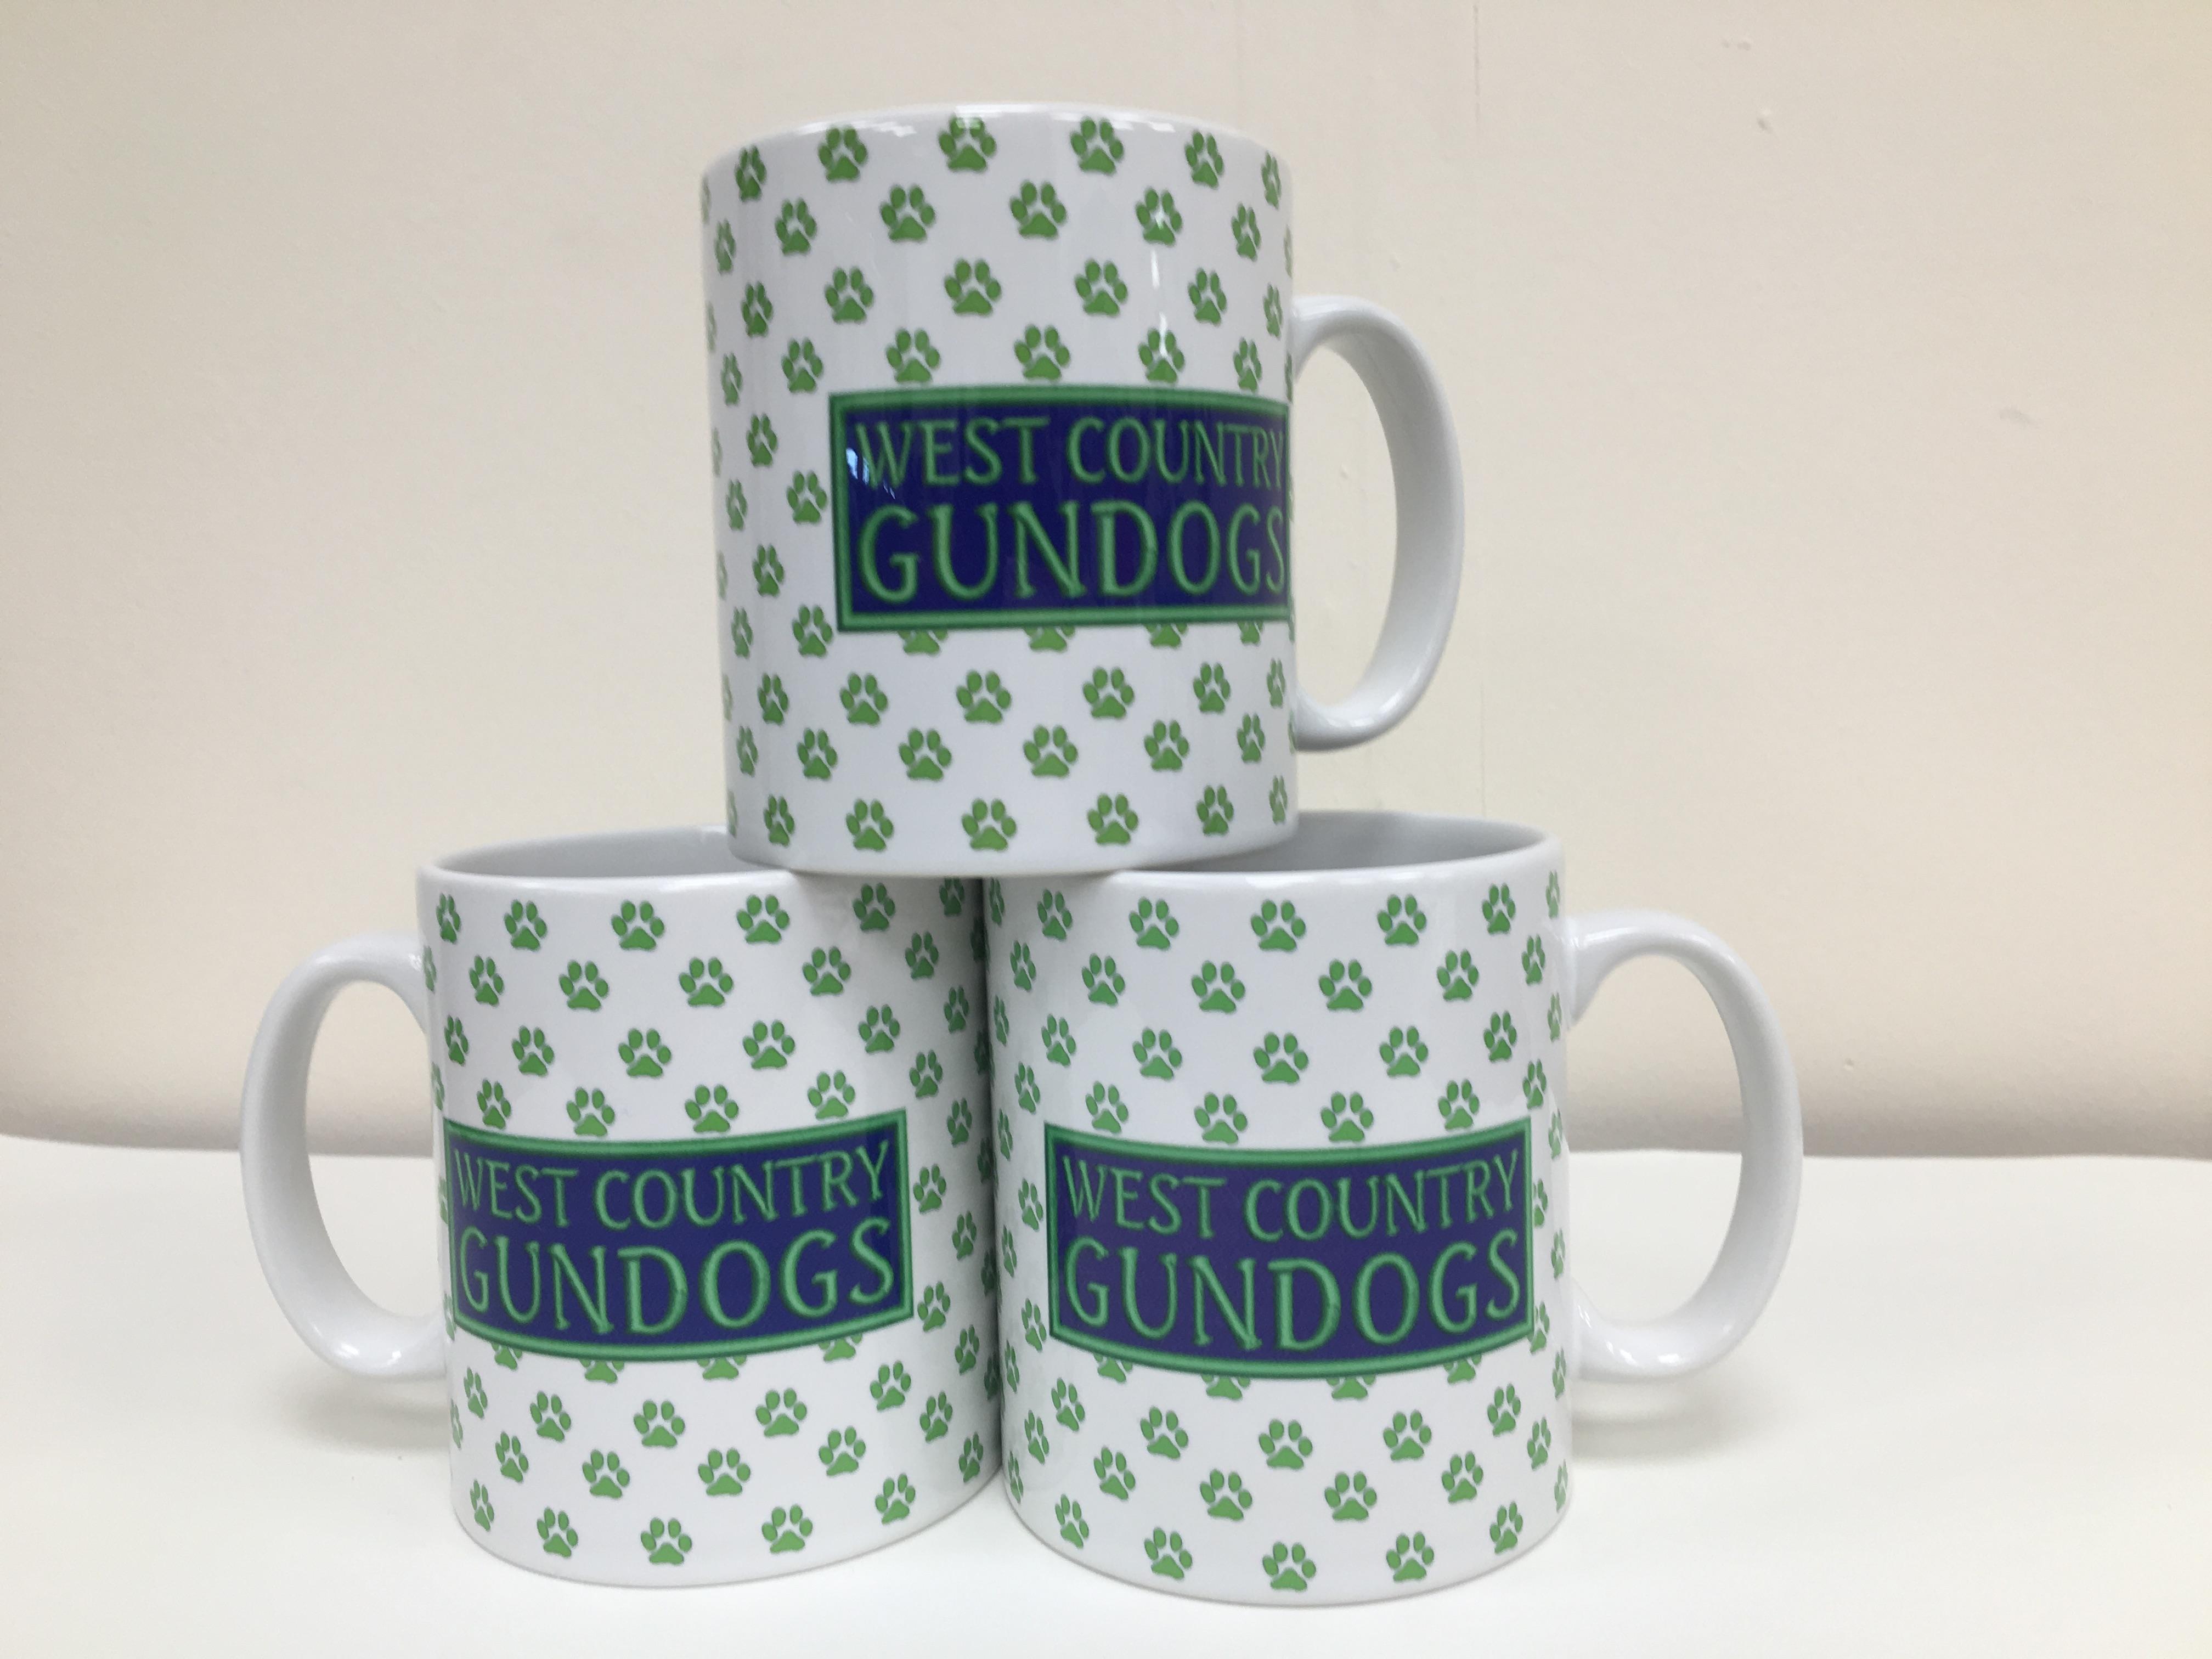 In-house printed mugs